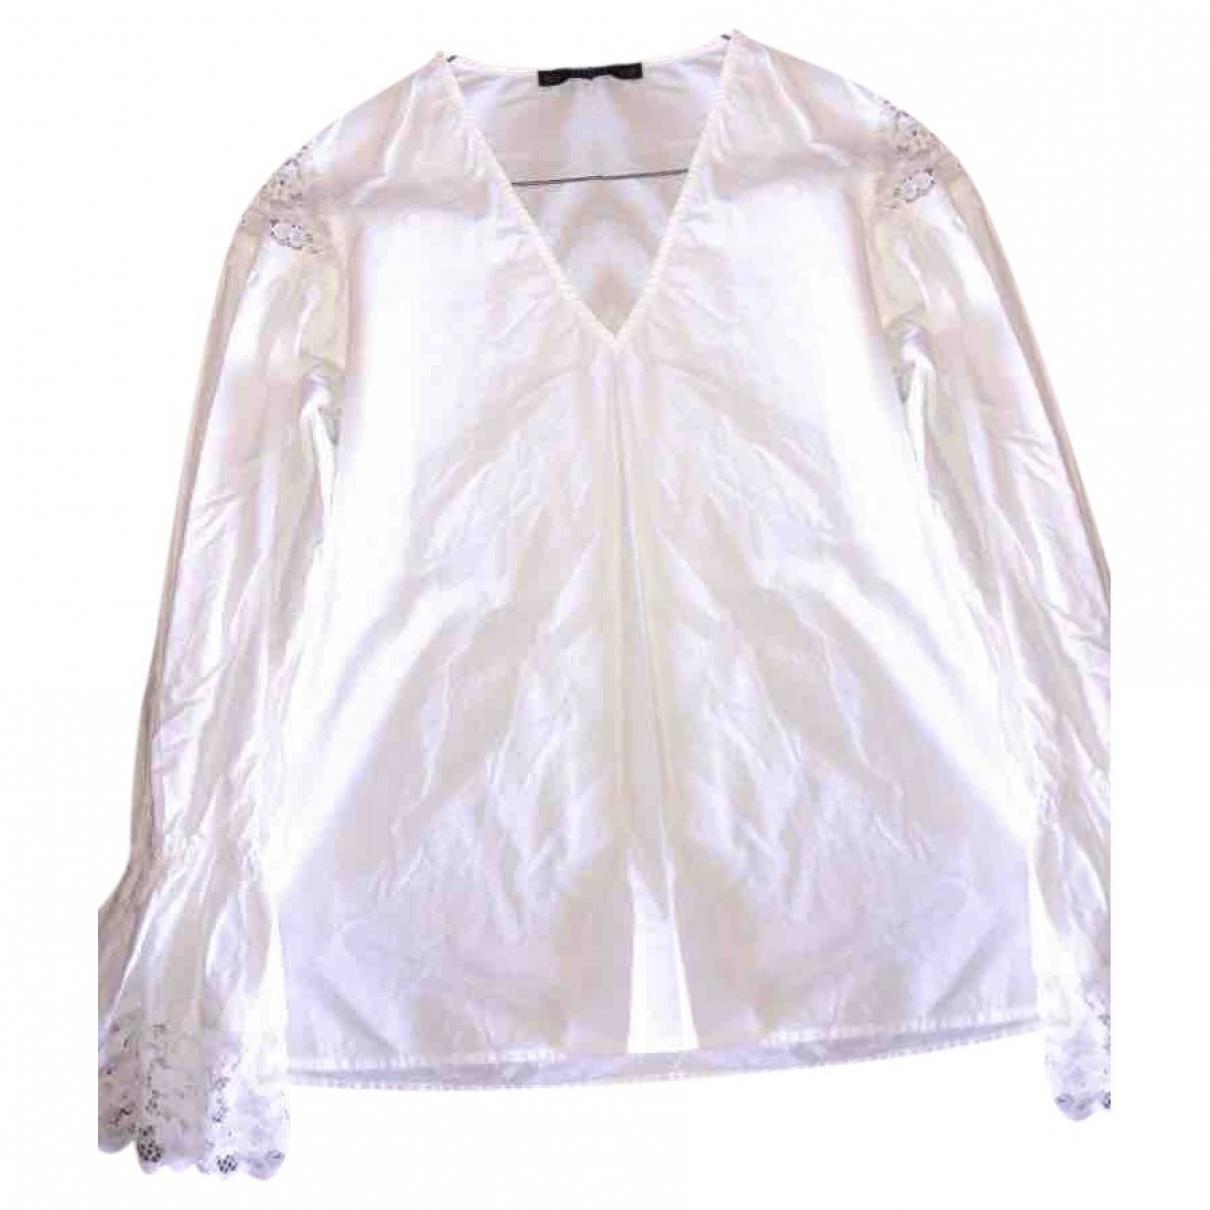 Zara \N White Cotton  top for Women 36 FR